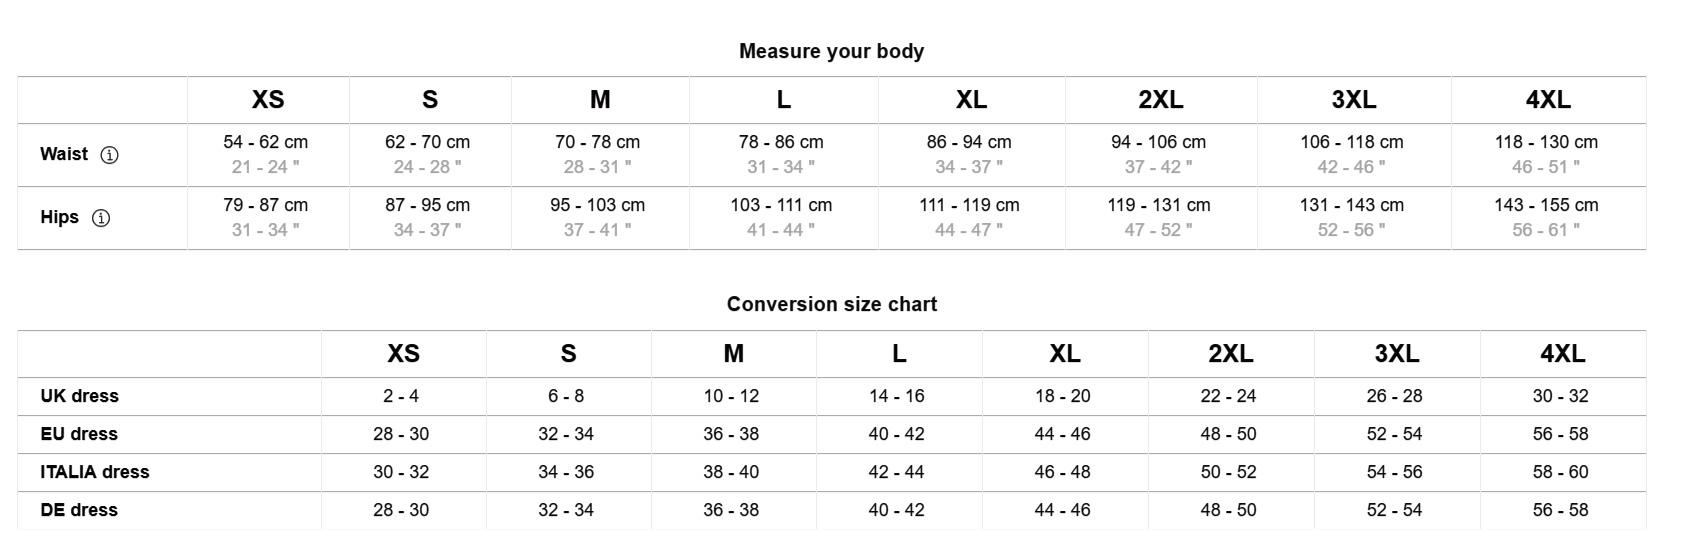 Design-your-own-leggings-size-chart-details